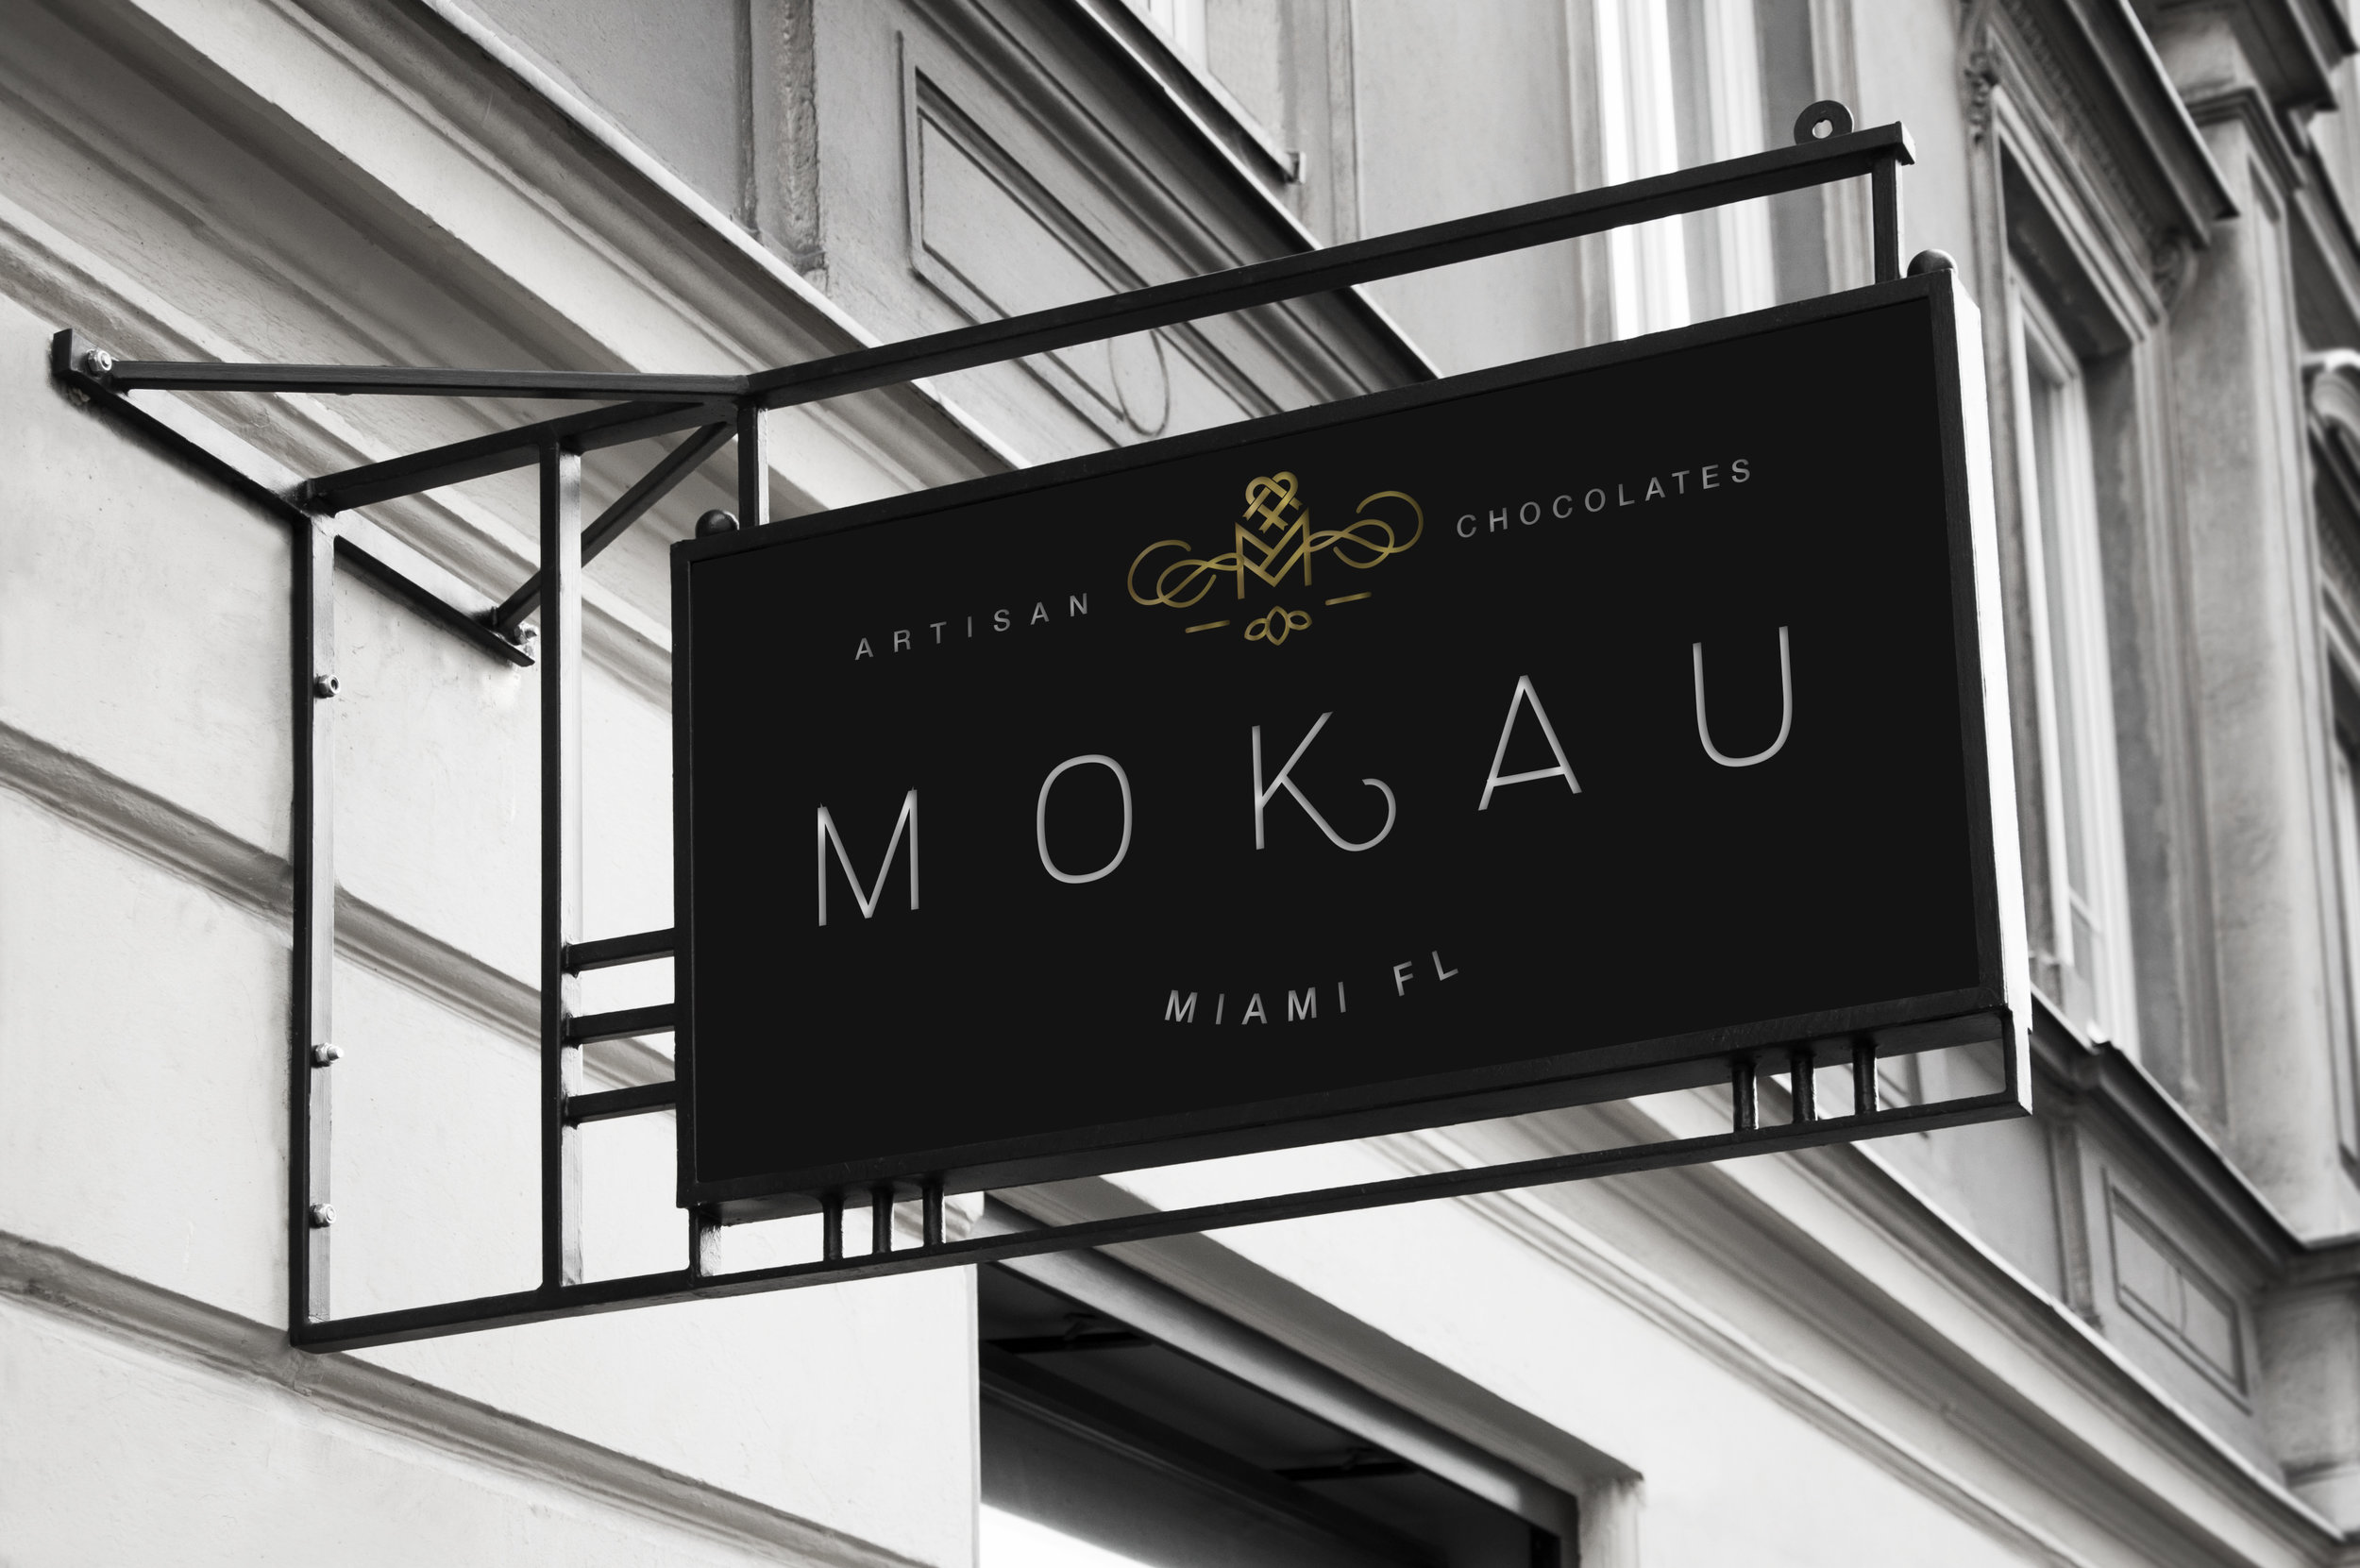 01_Restaurant+_+Coffee+Shop+Signs+Mockup.jpg